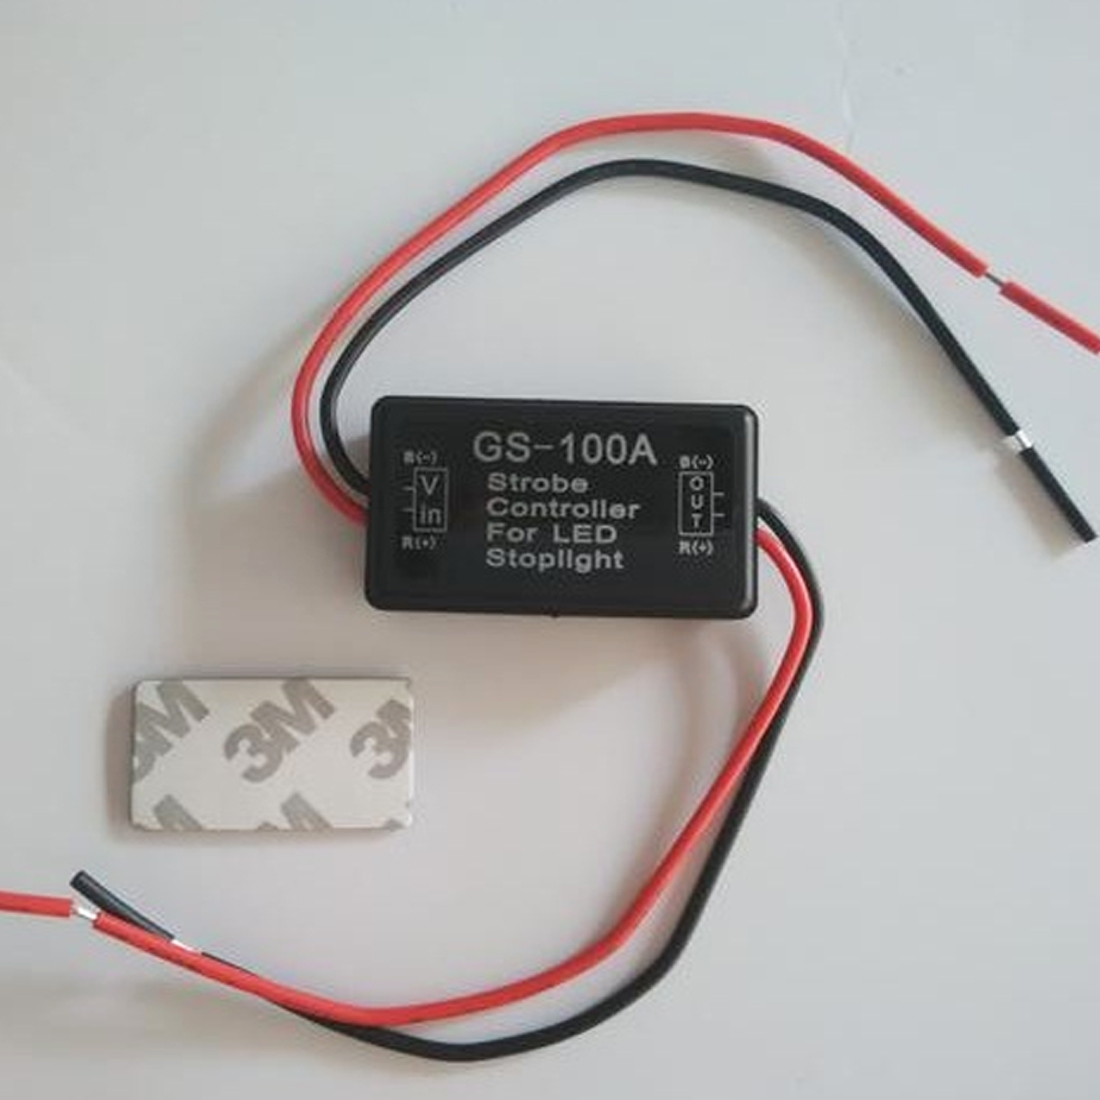 Dewtreetali Good Sale GS-100A 12--24V Flash Strobe Controller Flasher for LED Flashing Back Rear Brake Stop Light Lamp